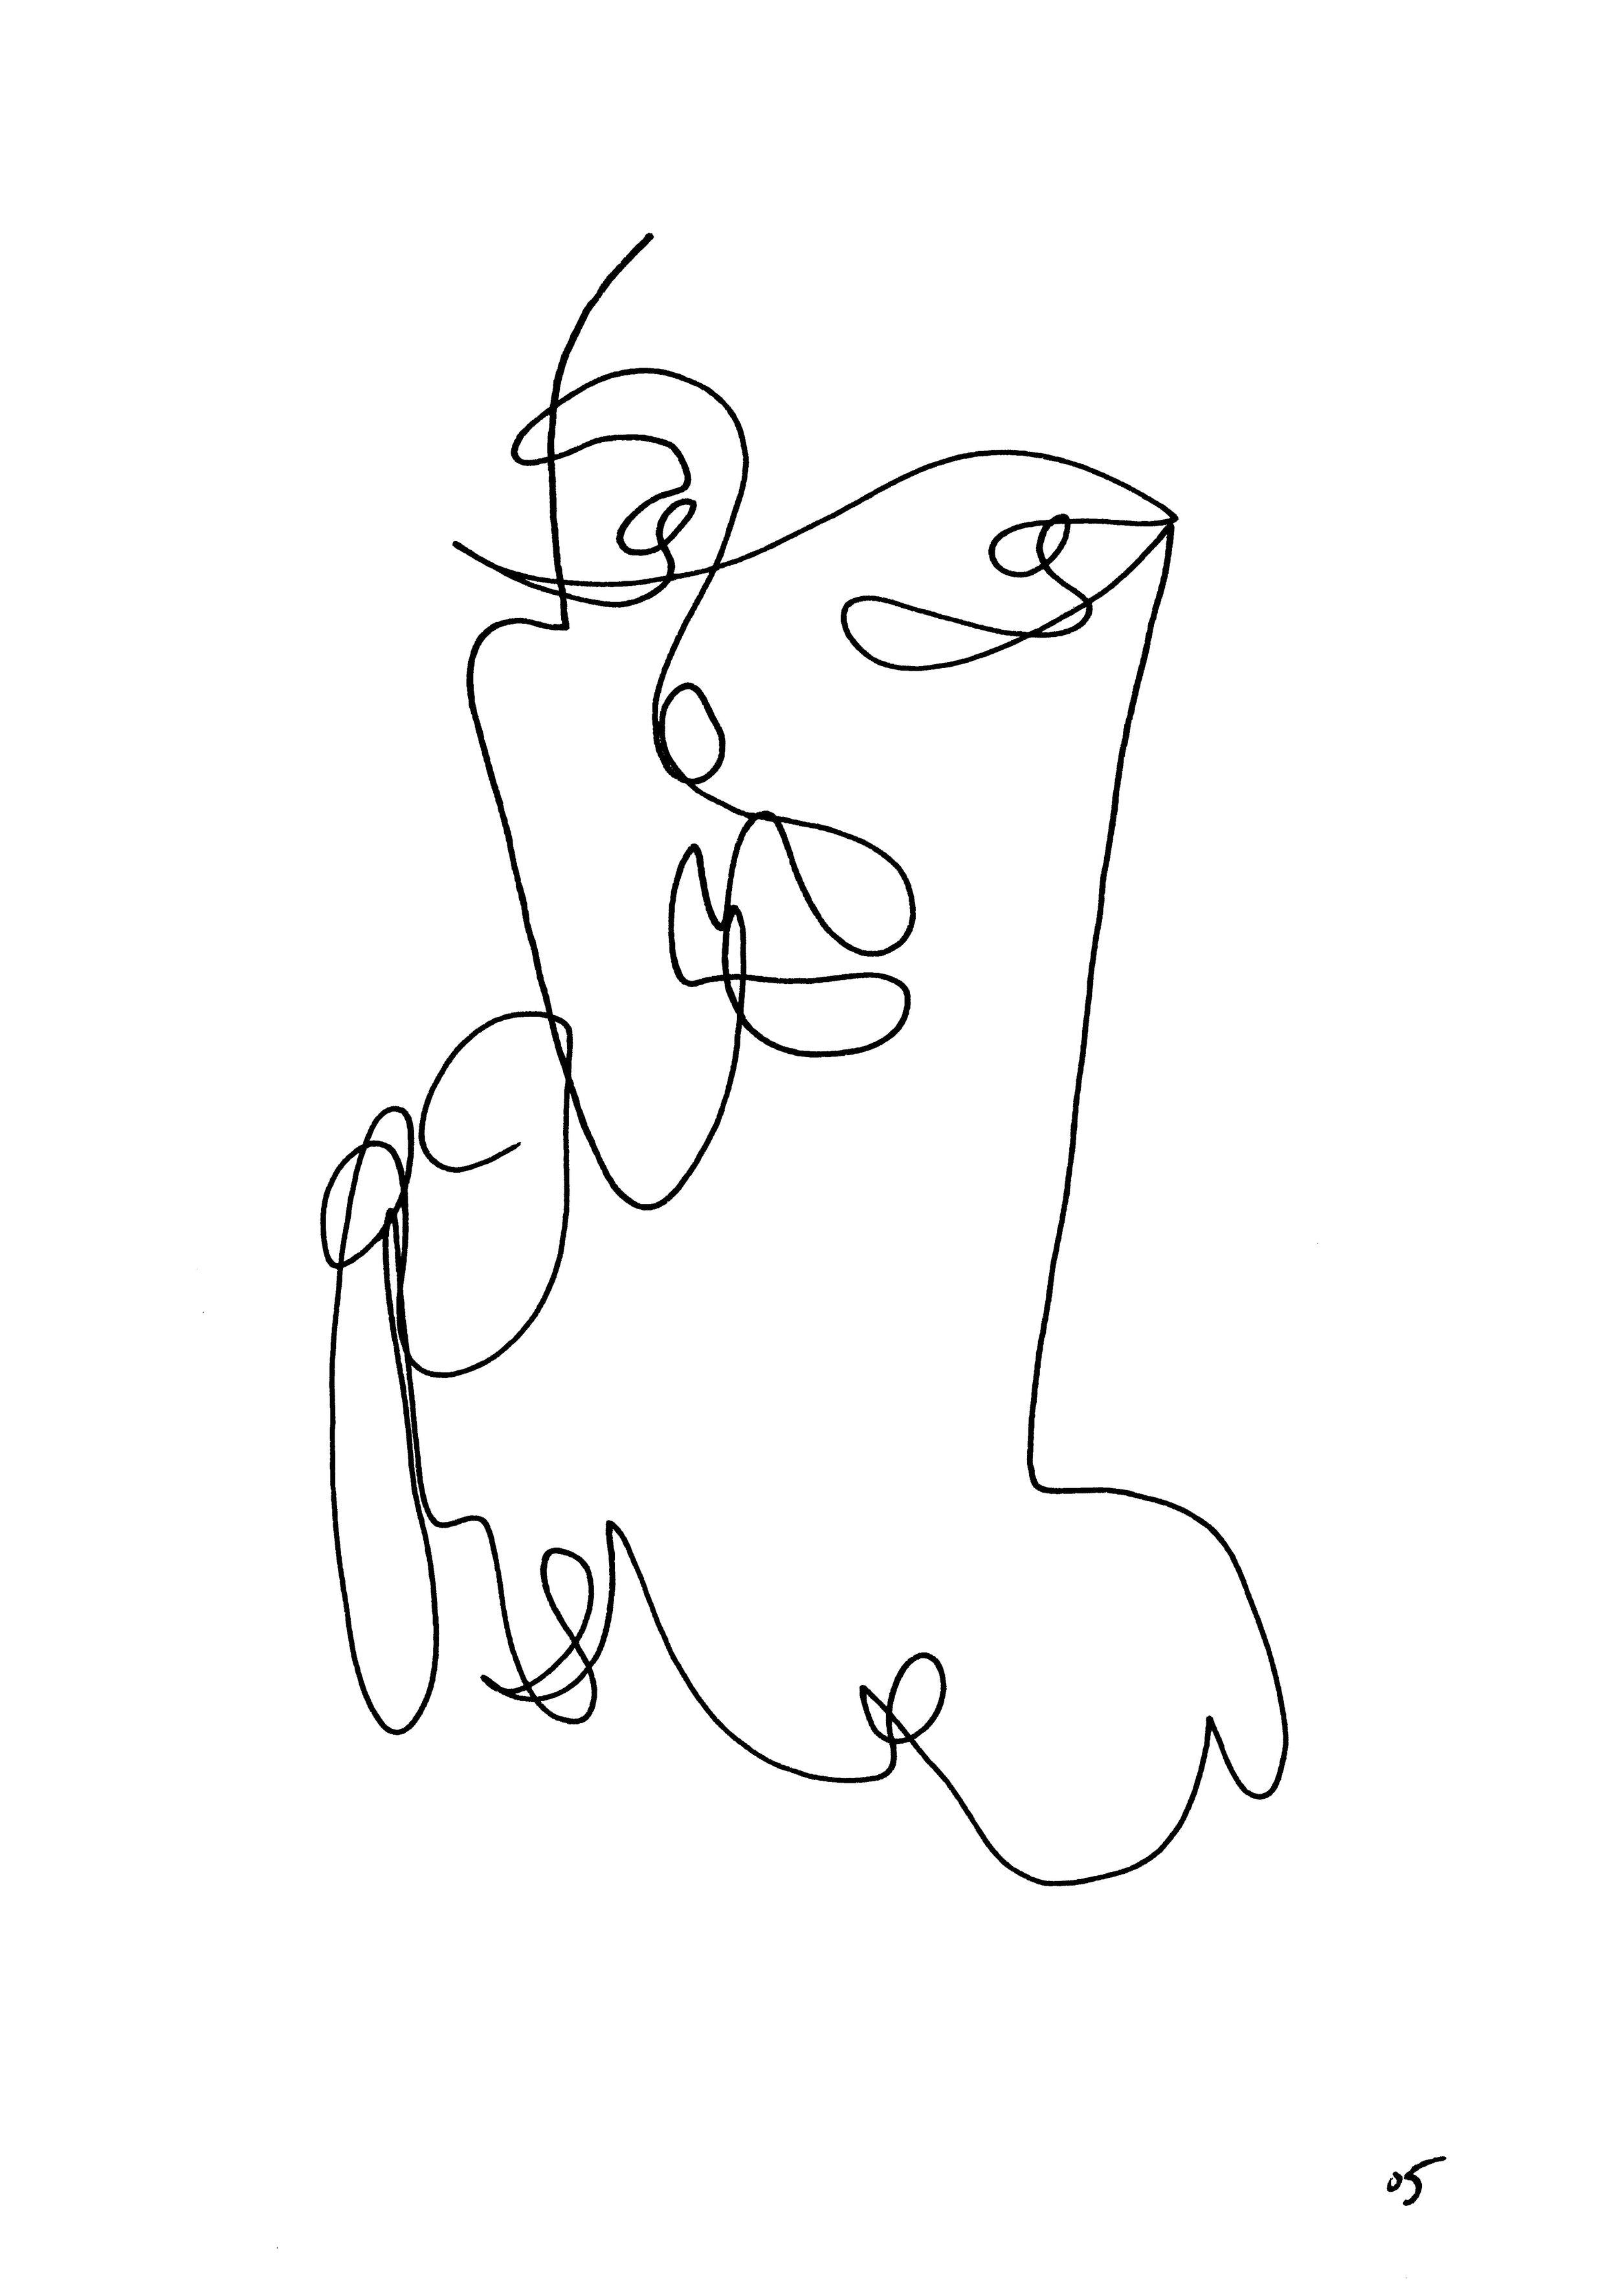 05 |  who nose